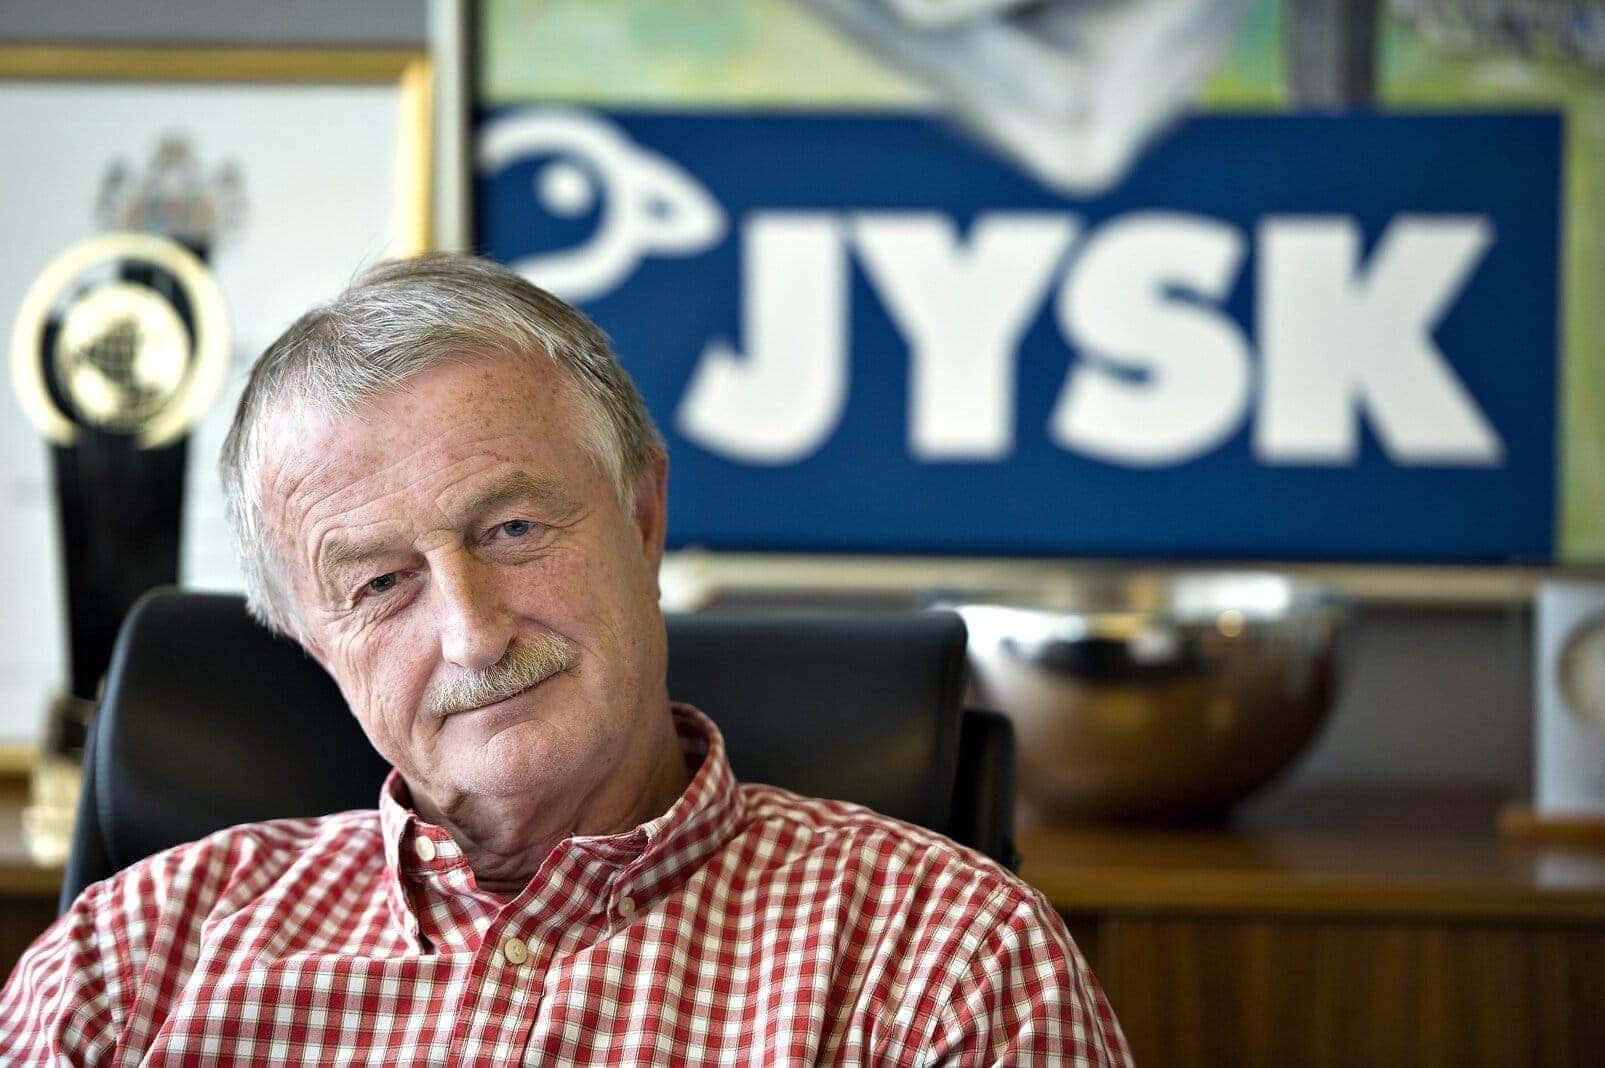 Lars Larsen, Dänisches Bettenlager